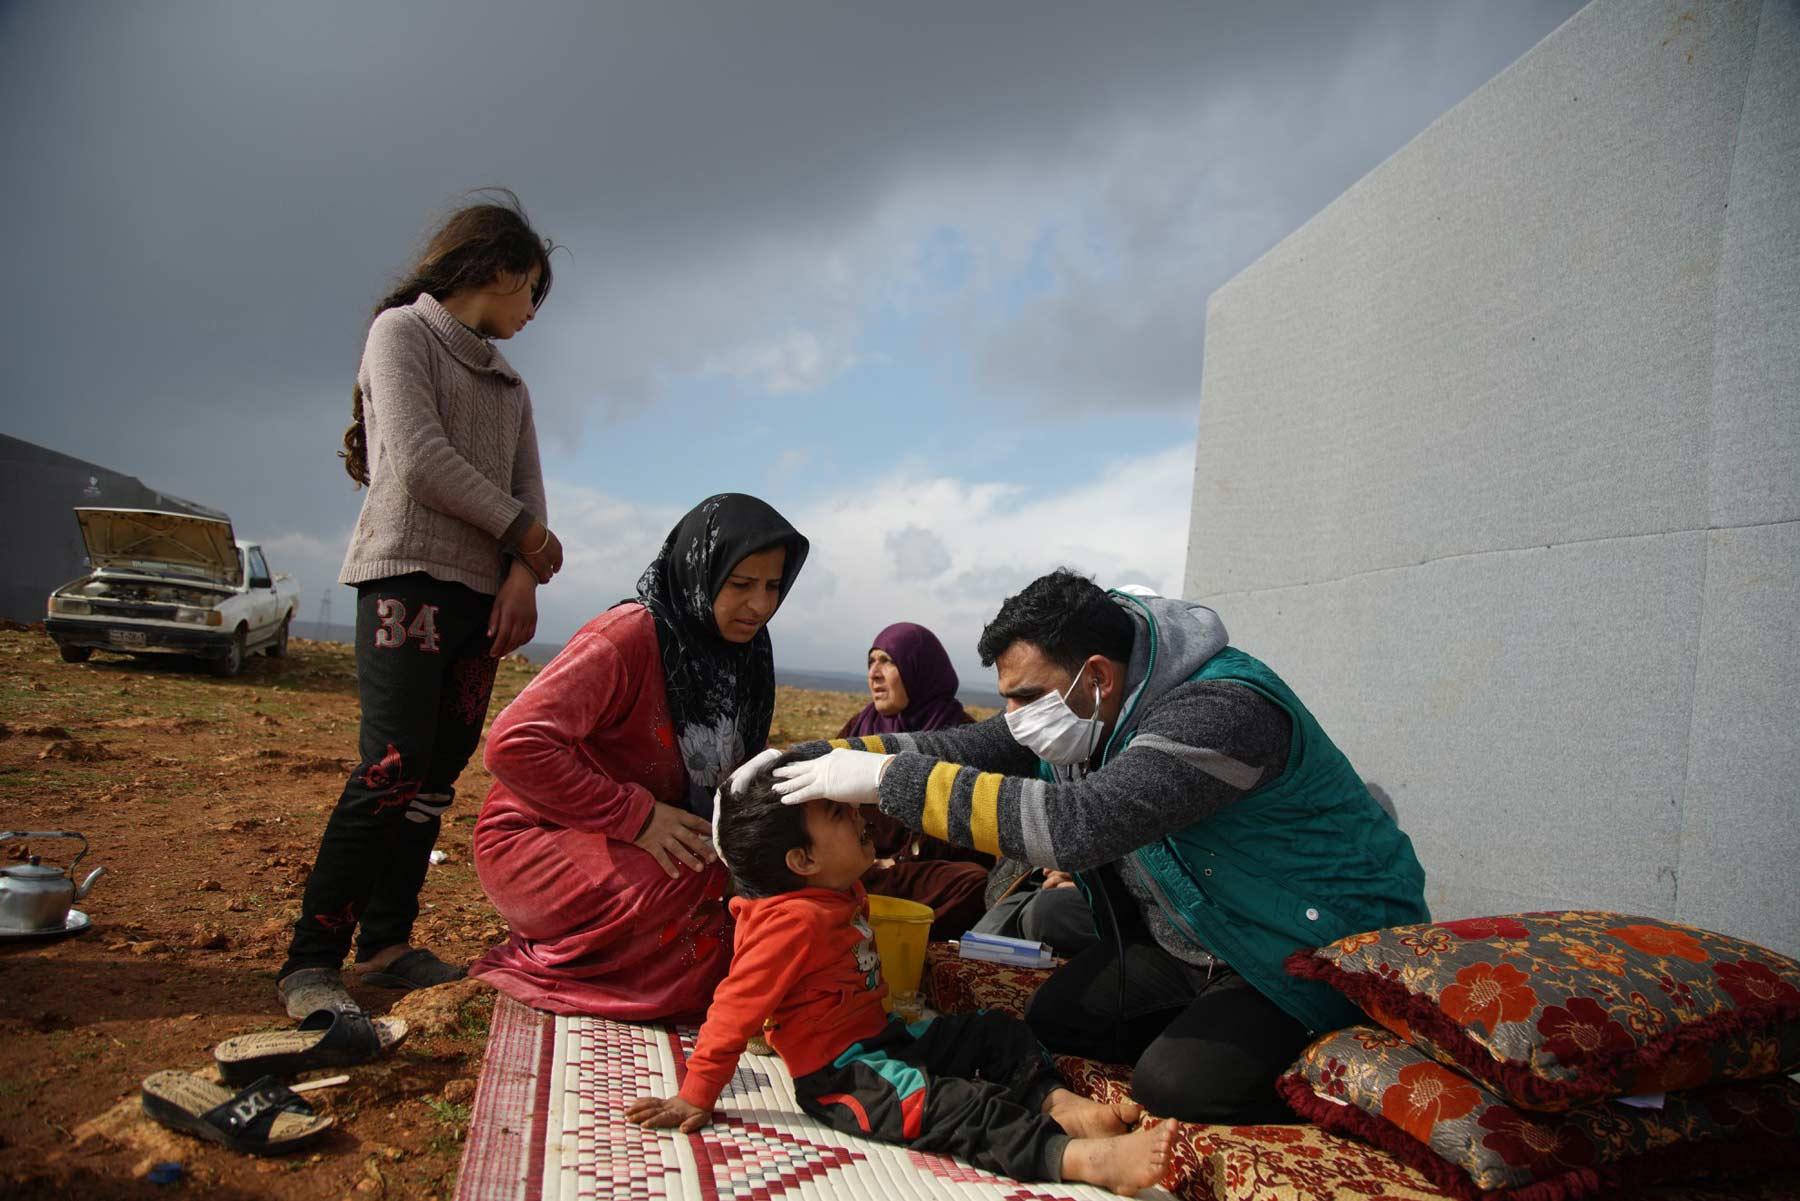 emergency-appeal-syria-v2-15102019.jpg